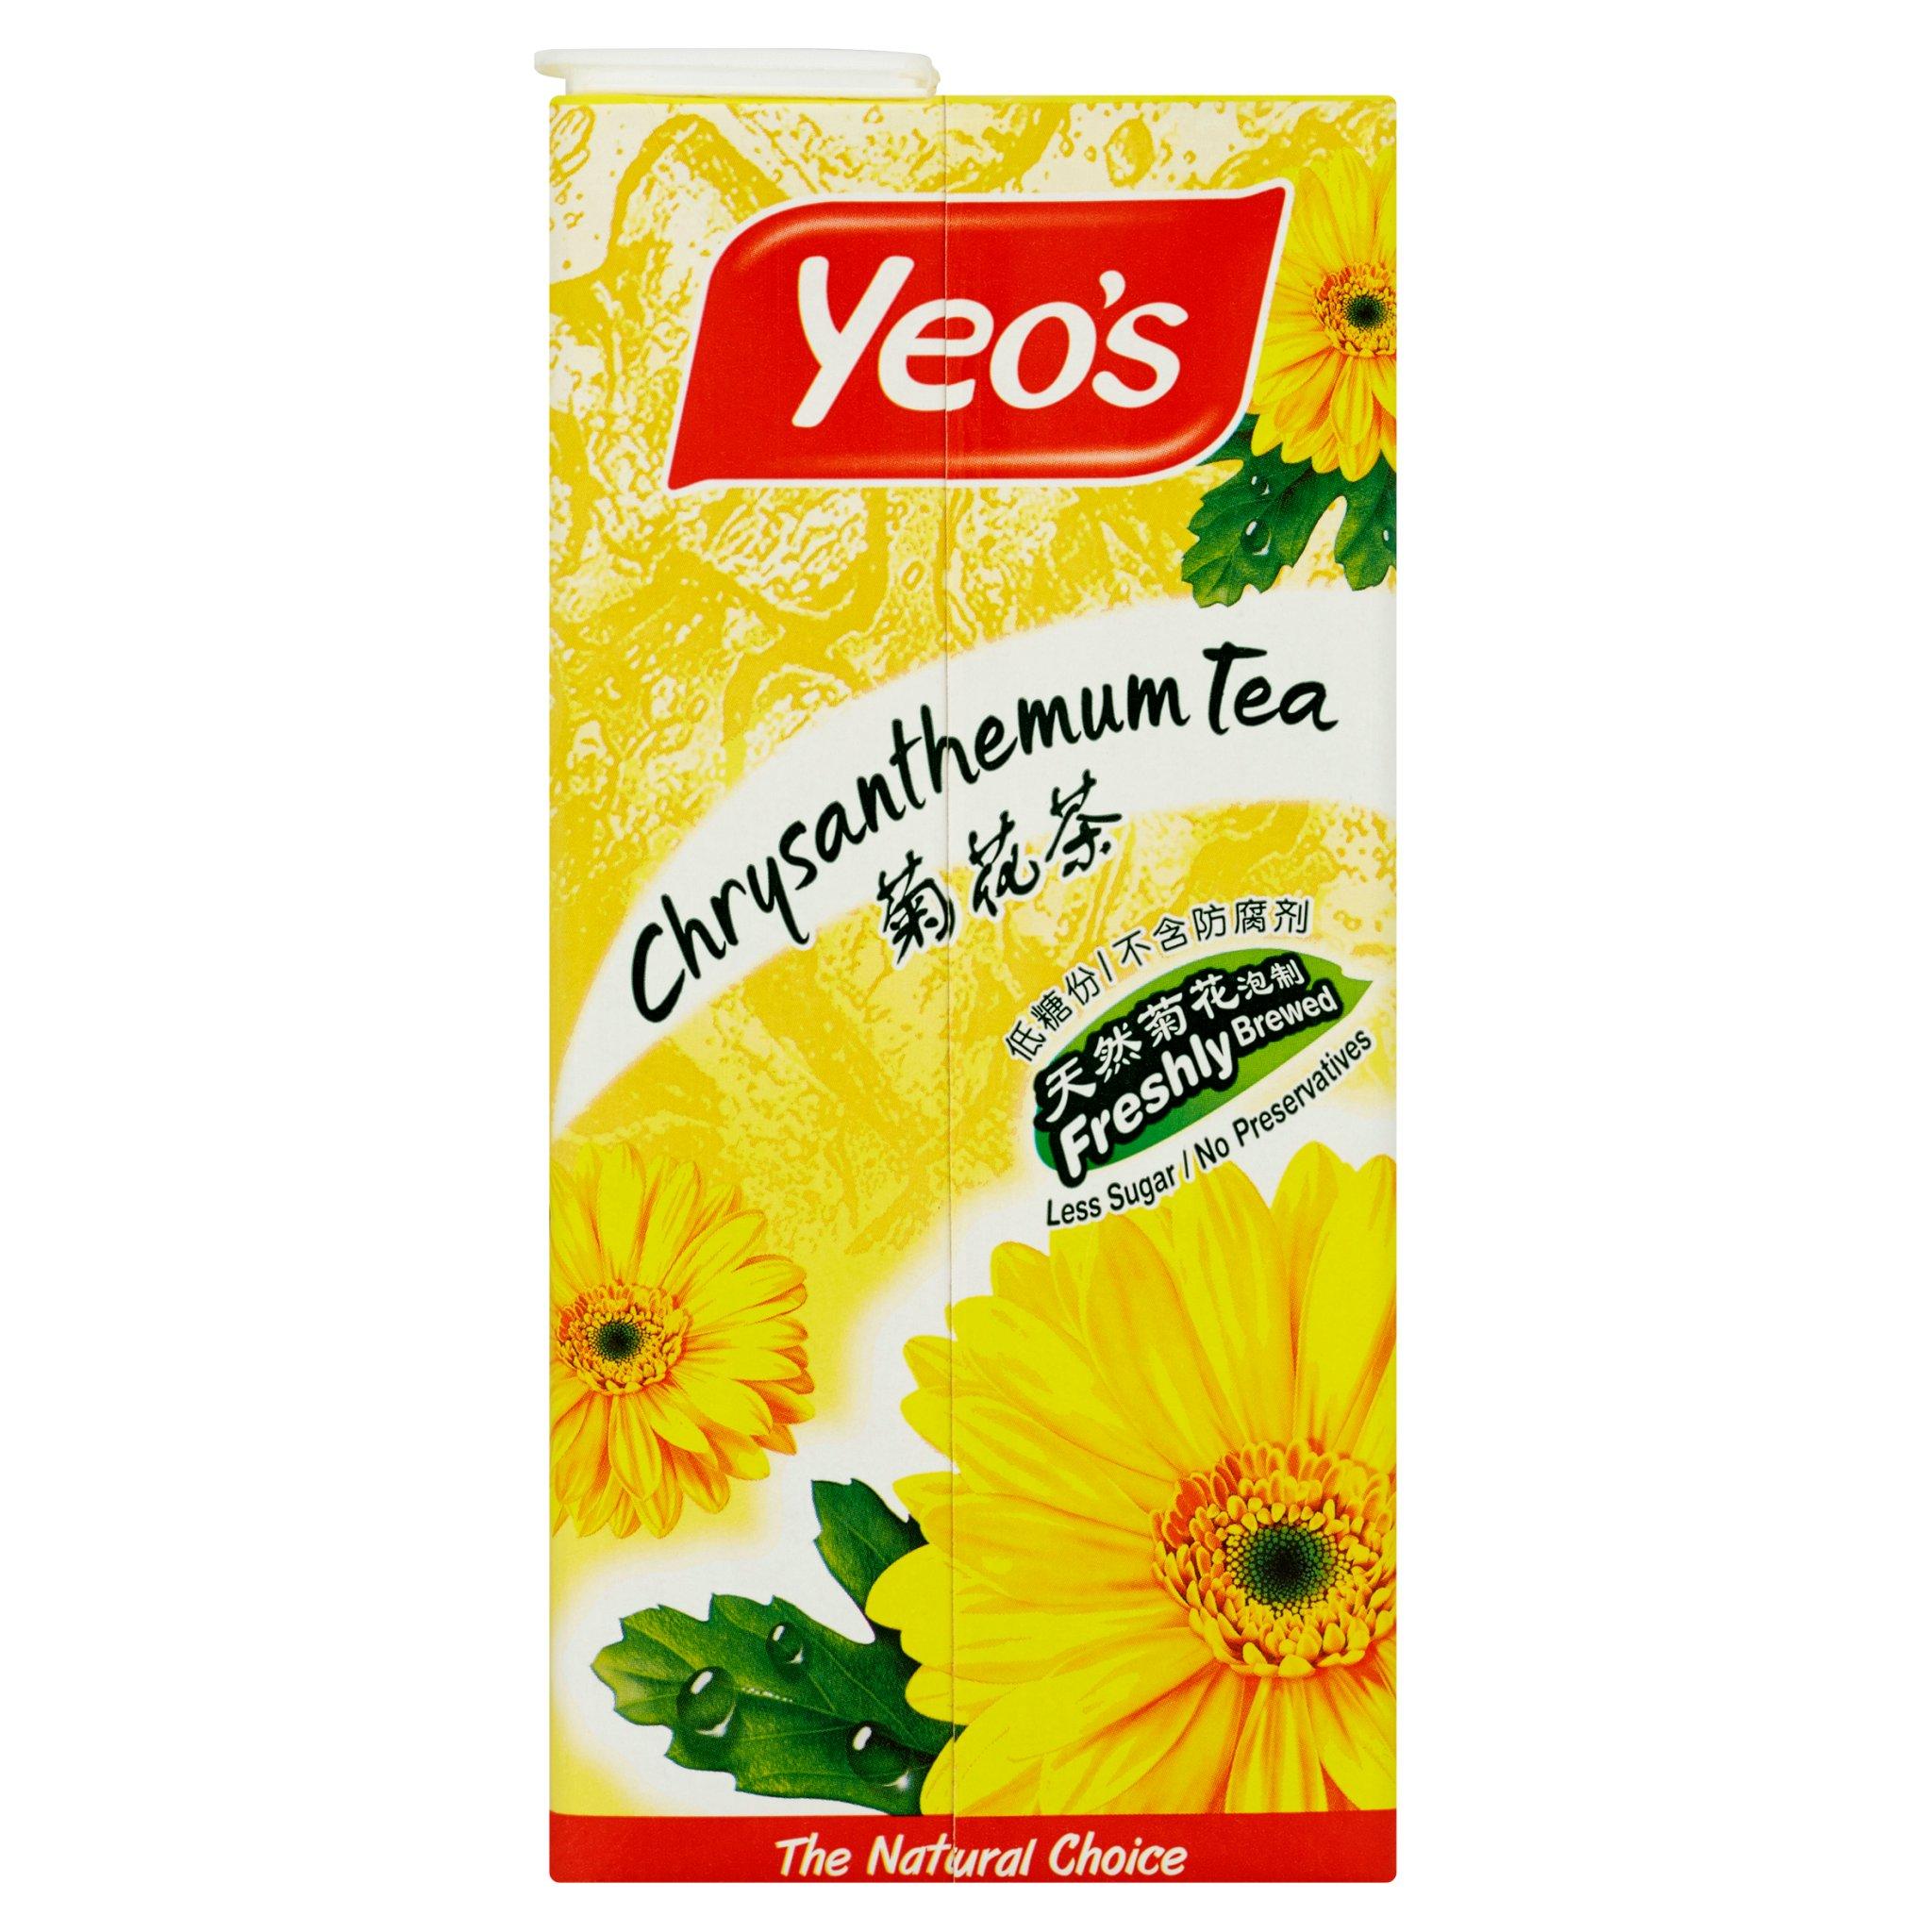 Yeo's Chrysanthemum Tea (1L)